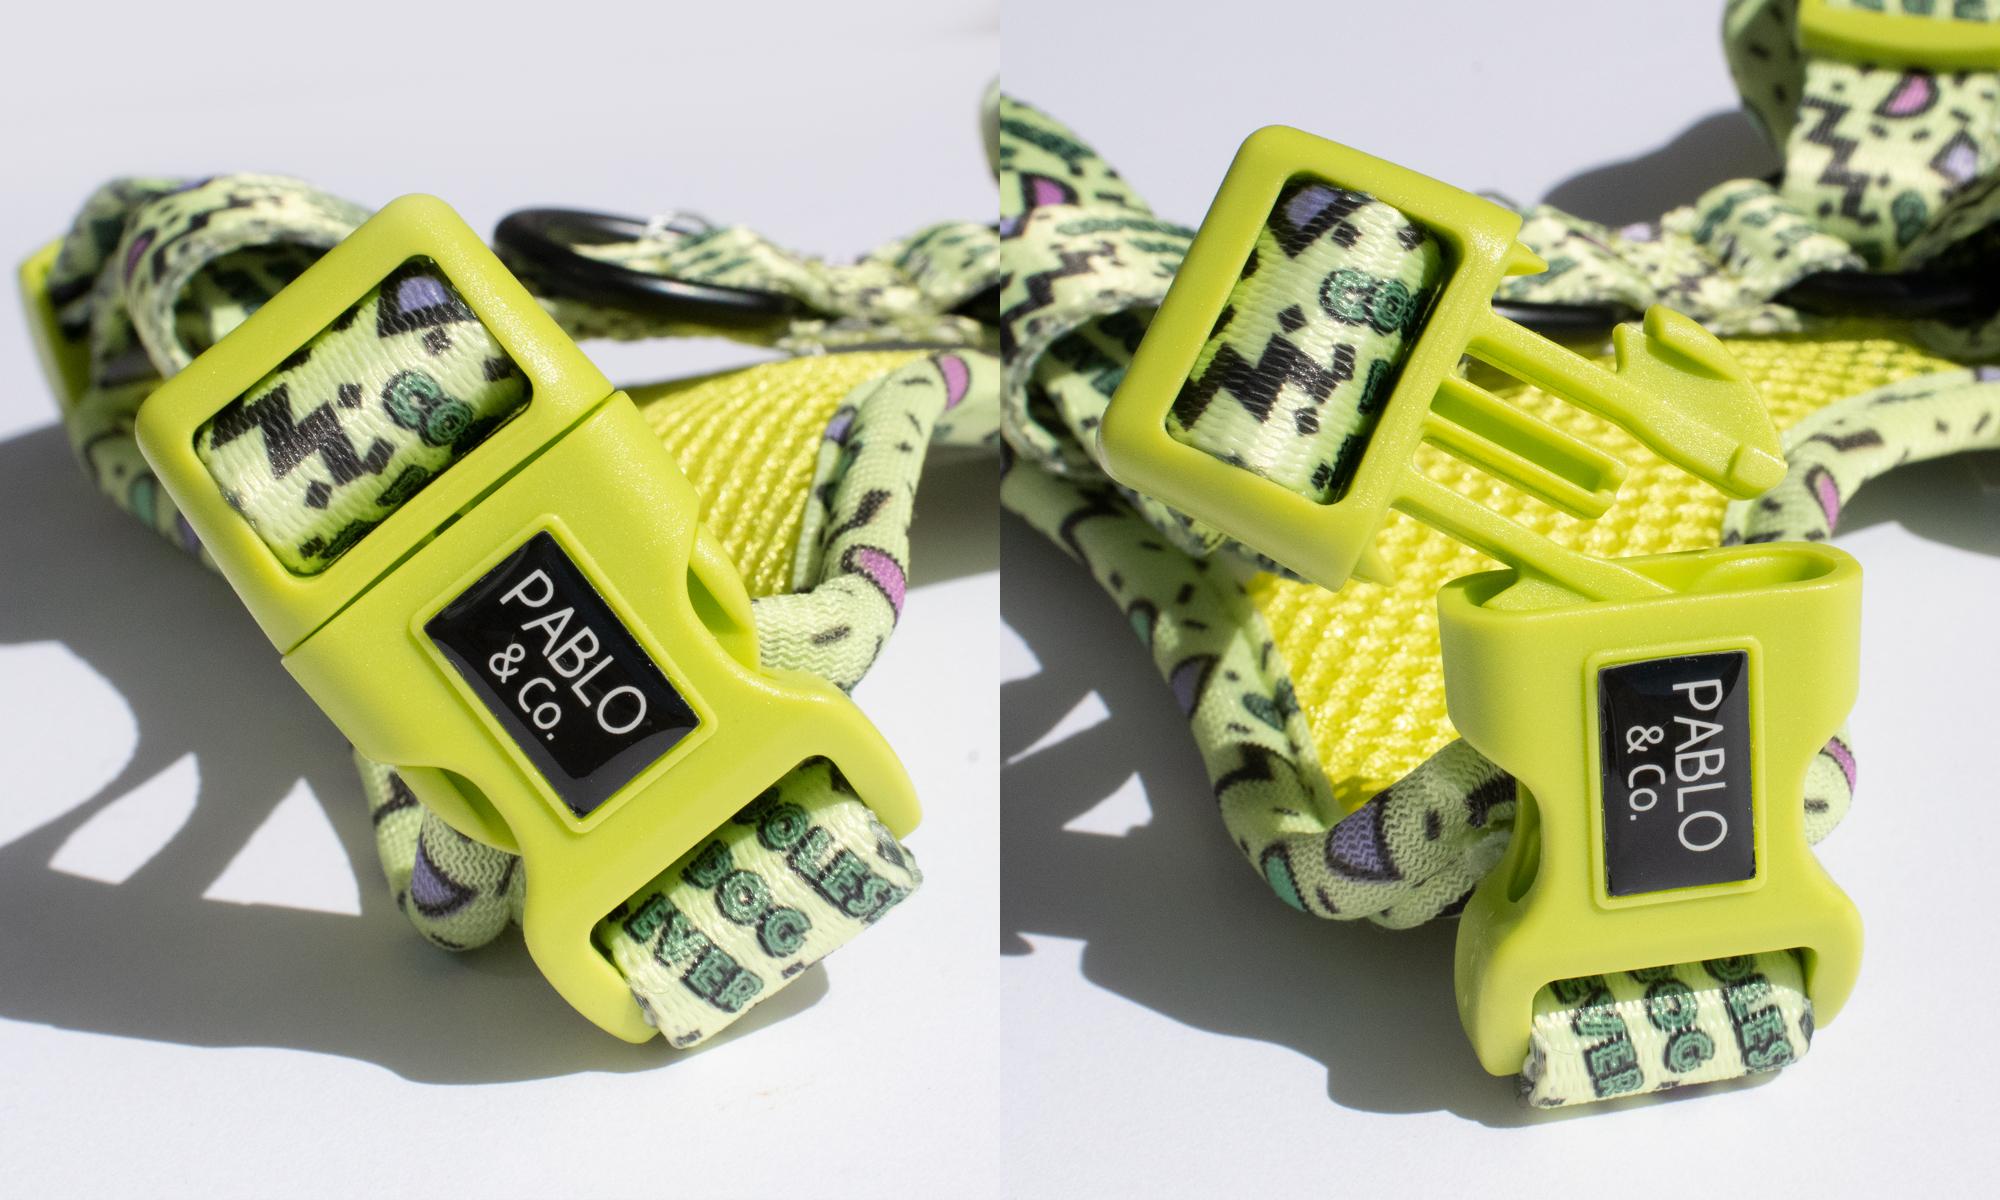 Pablo&Co   Harness   Coolest Dog Ever 強力フックでしっかり留めてくれます